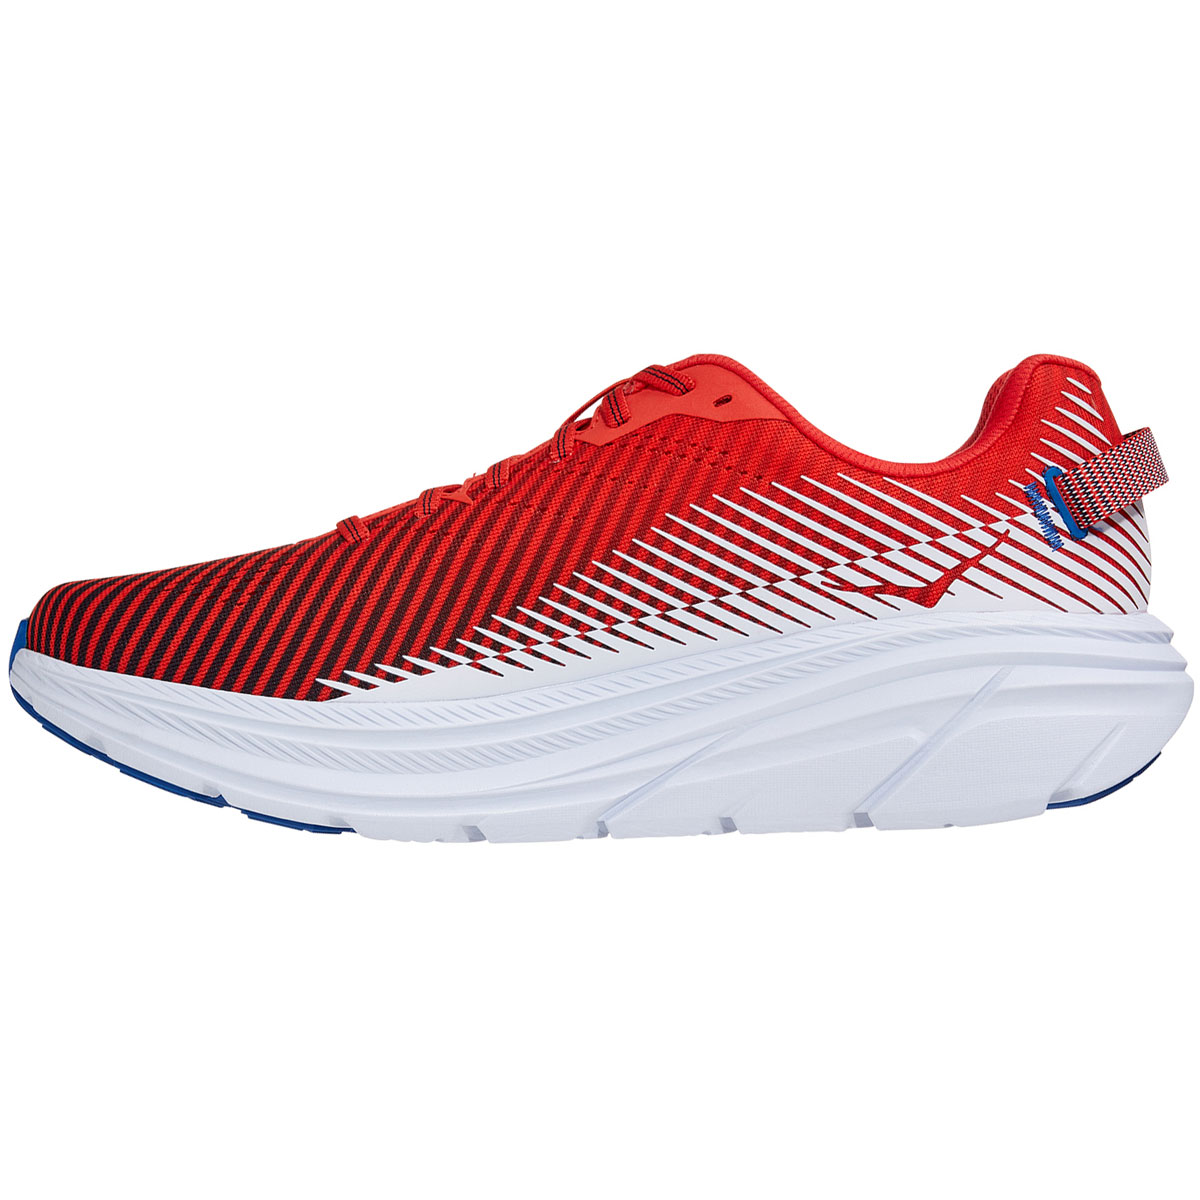 Men's Hoka One One Rincon 2 Running Shoe - Color: Fiesta/Turkish White - Size: 7 - Width: Regular, Fiesta/Turkish White, large, image 2